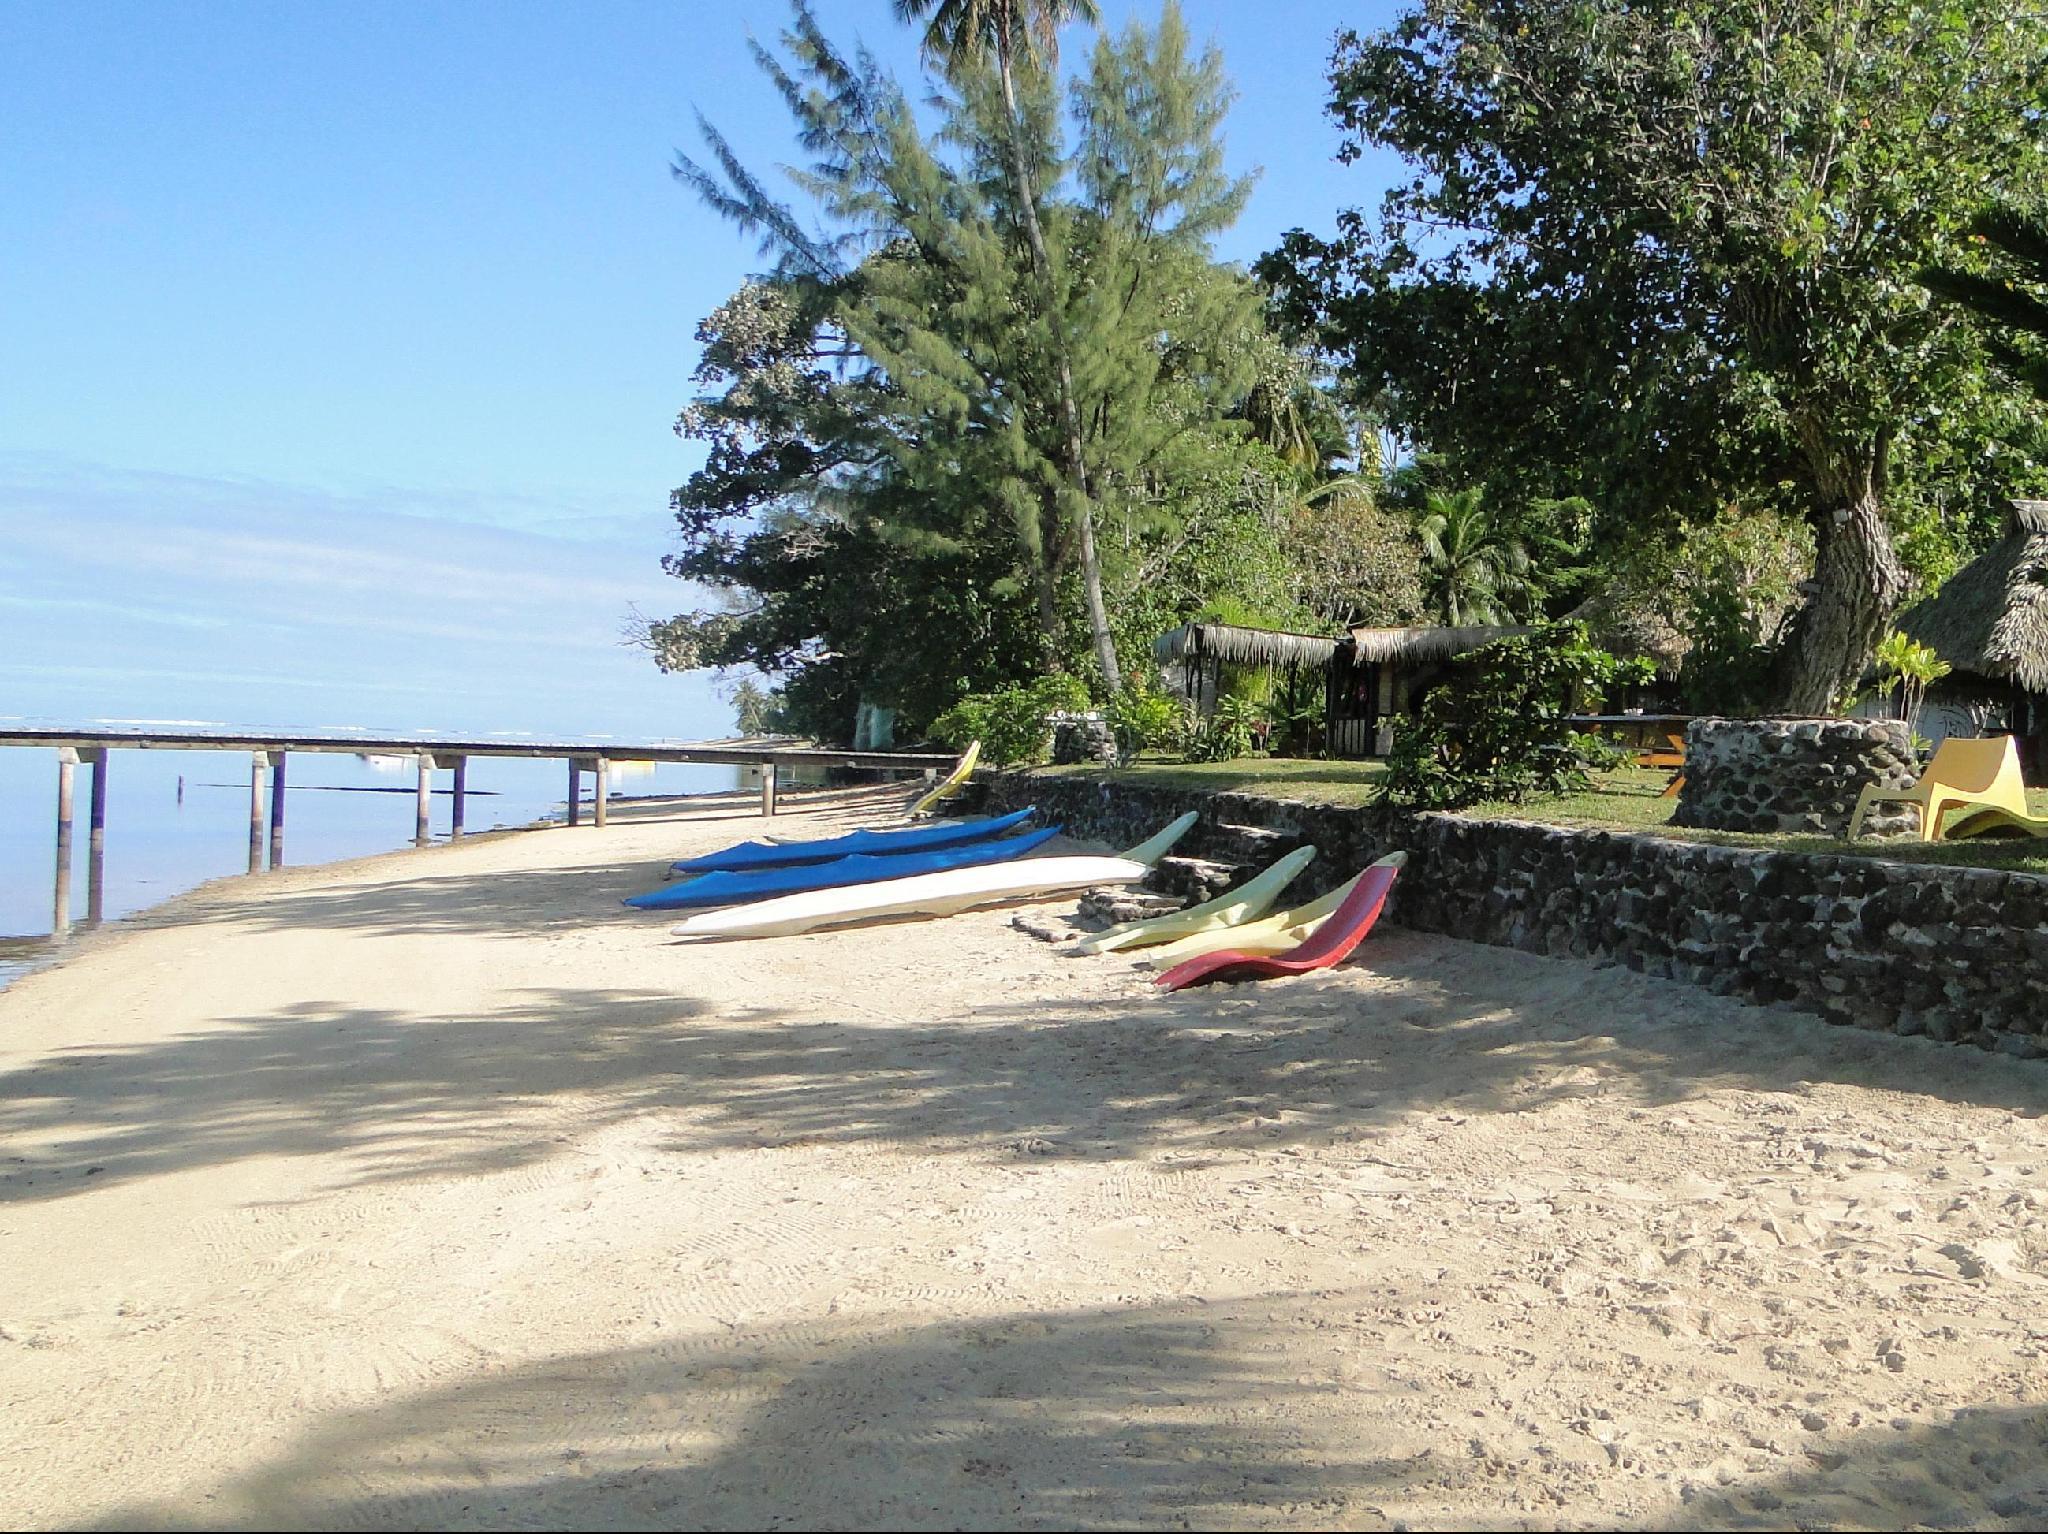 Linareva Moorea Beach Resort Moorea Island French